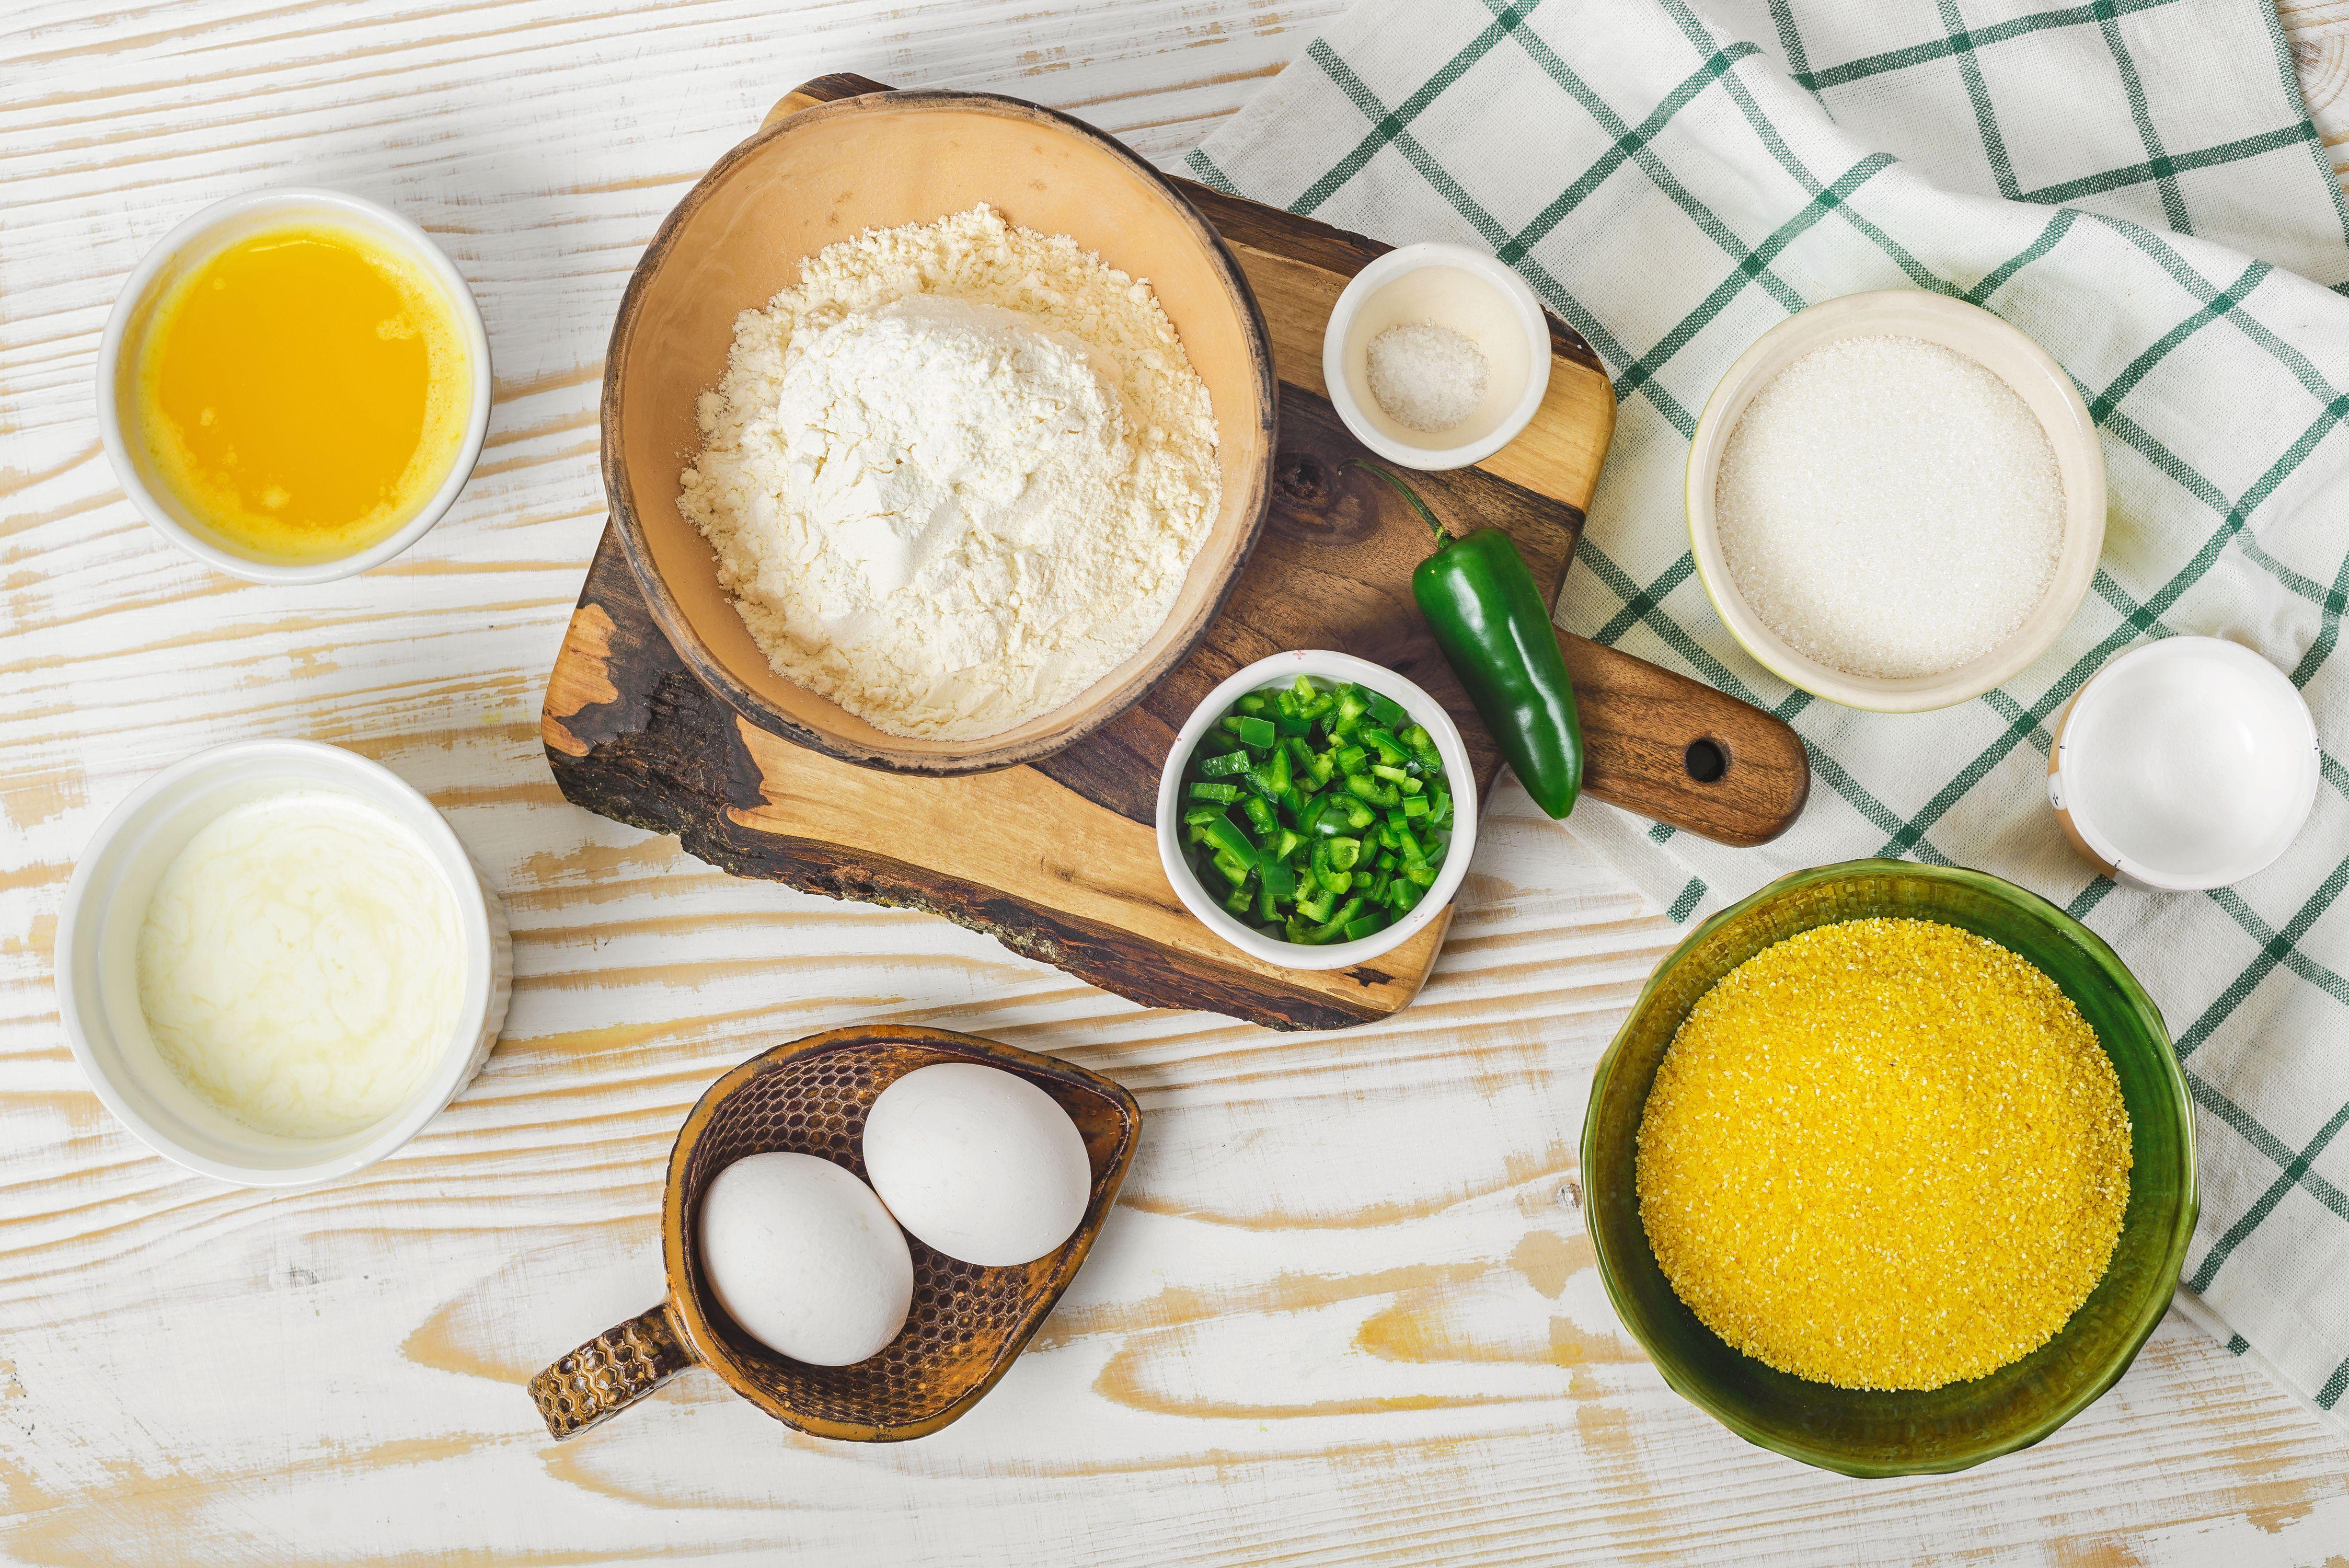 Ingredients for buttermilk jalapeno cornbread